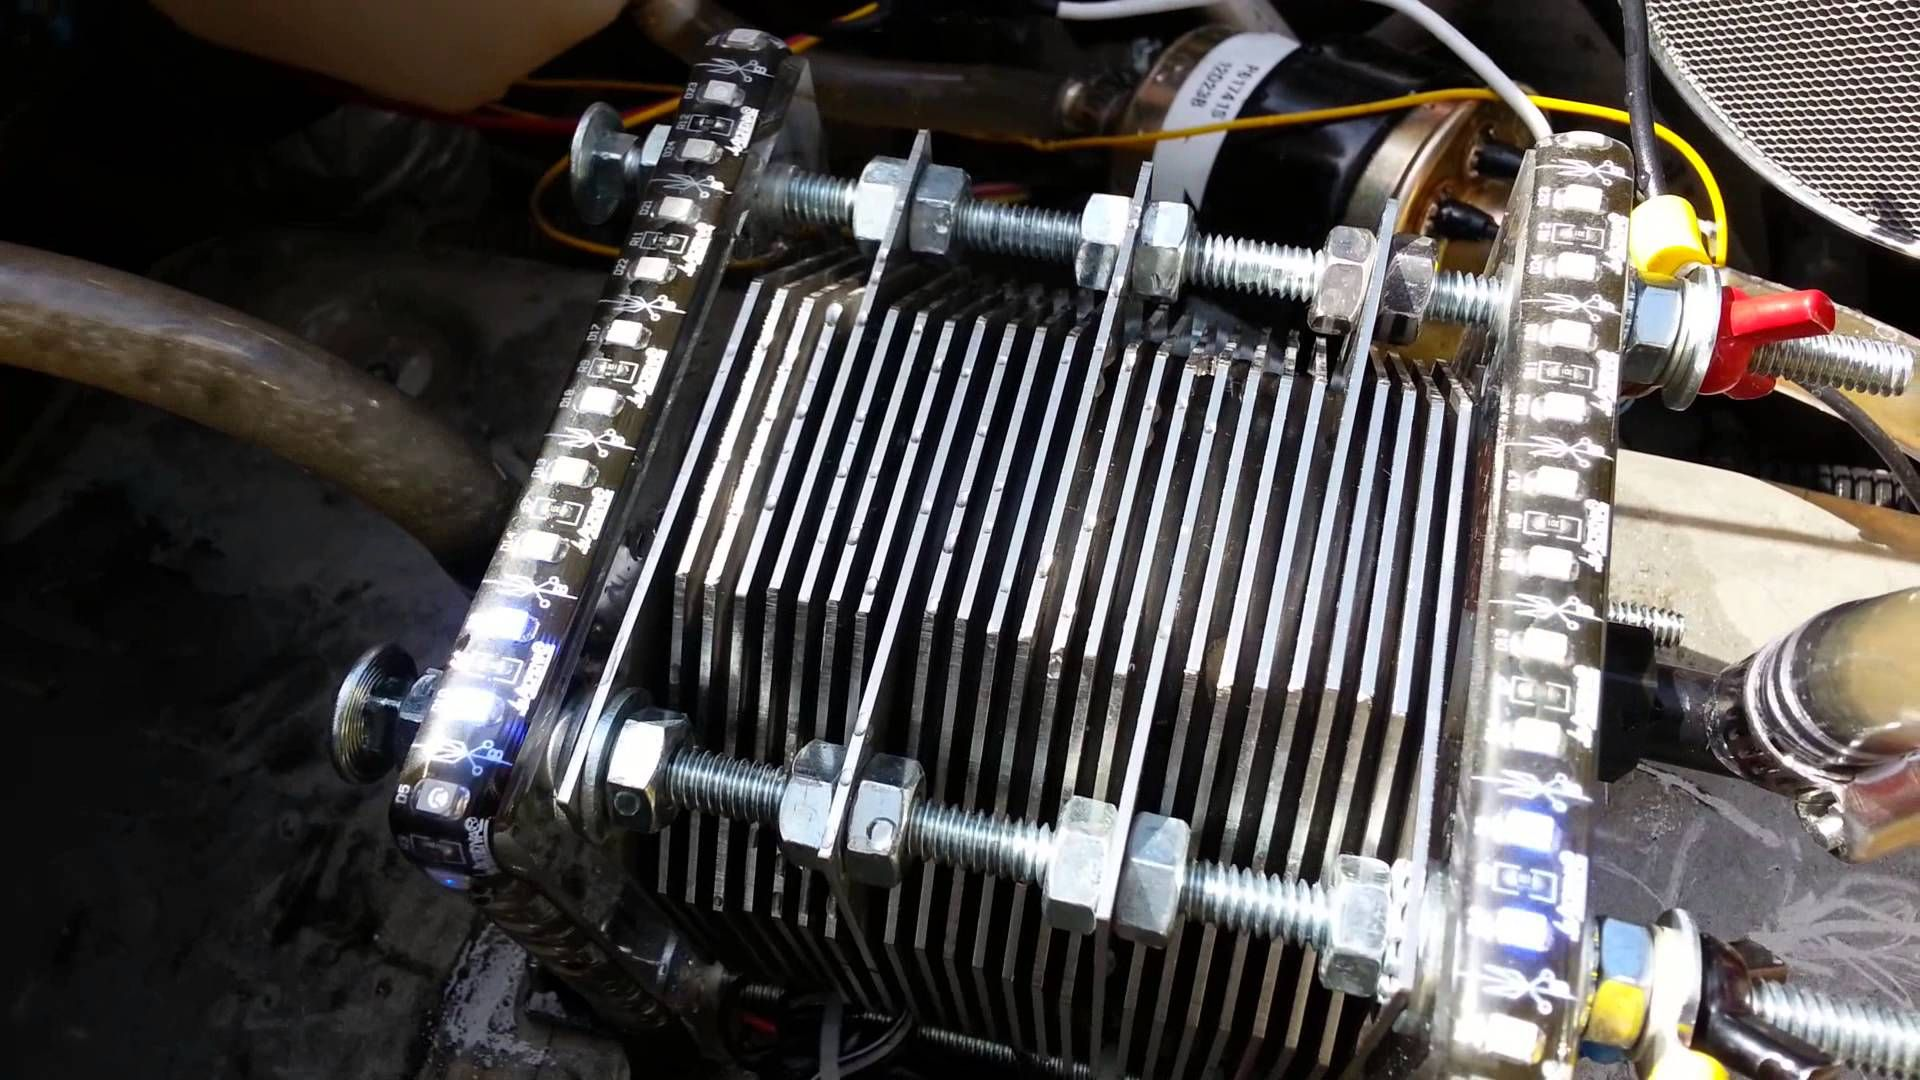 Midtech D2 HHO Hydrogen fuel cell 27 plate | Videos